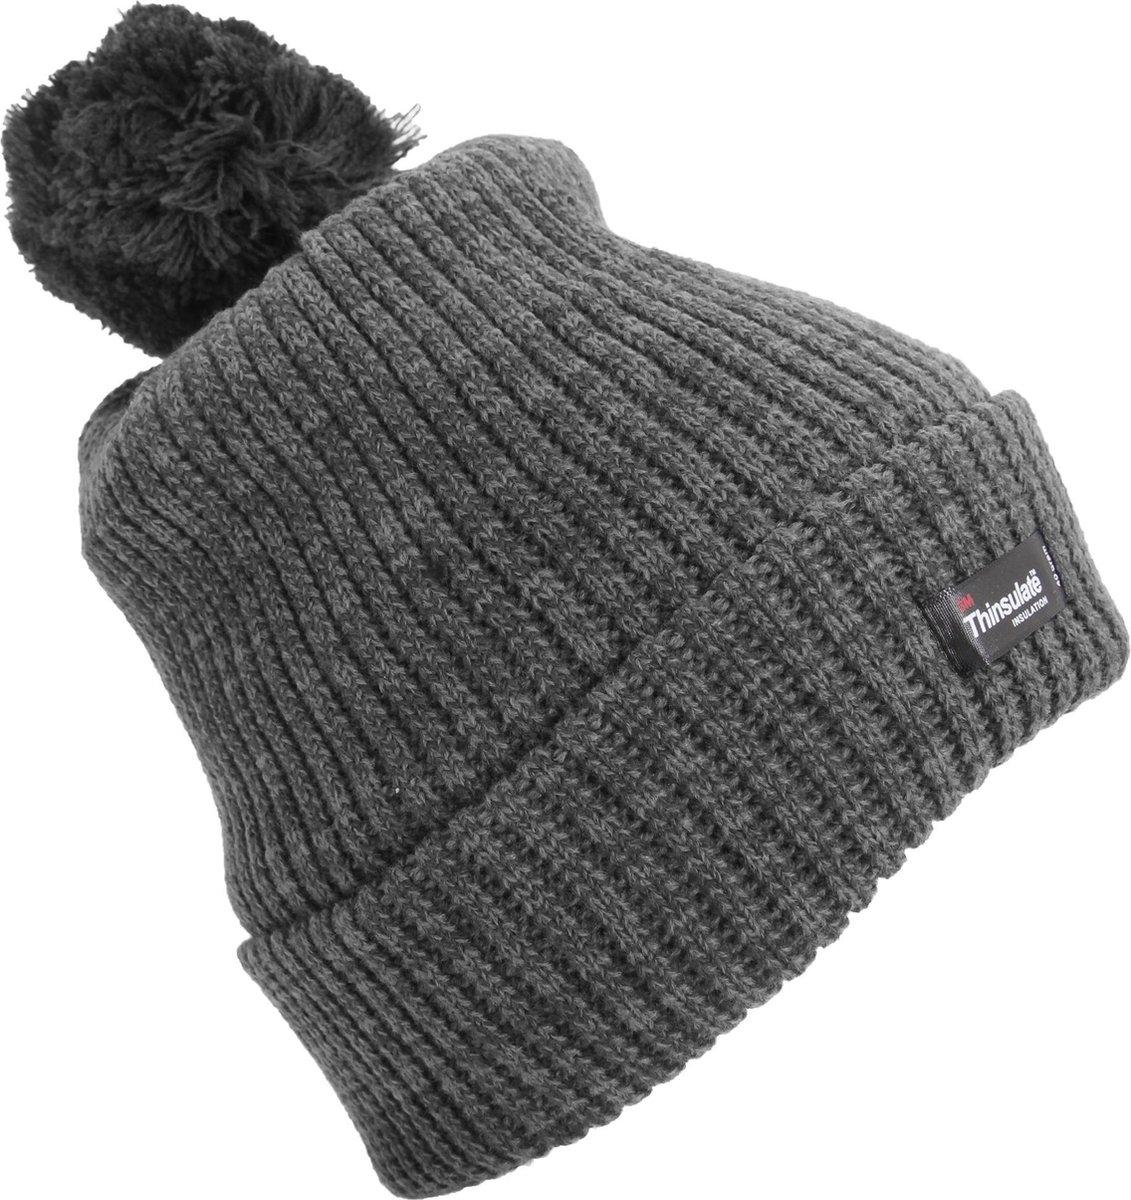 Vrouwen/dames Thinsulate Pom Pom Thermal Winter Hat (3M 40g) (Grijs)